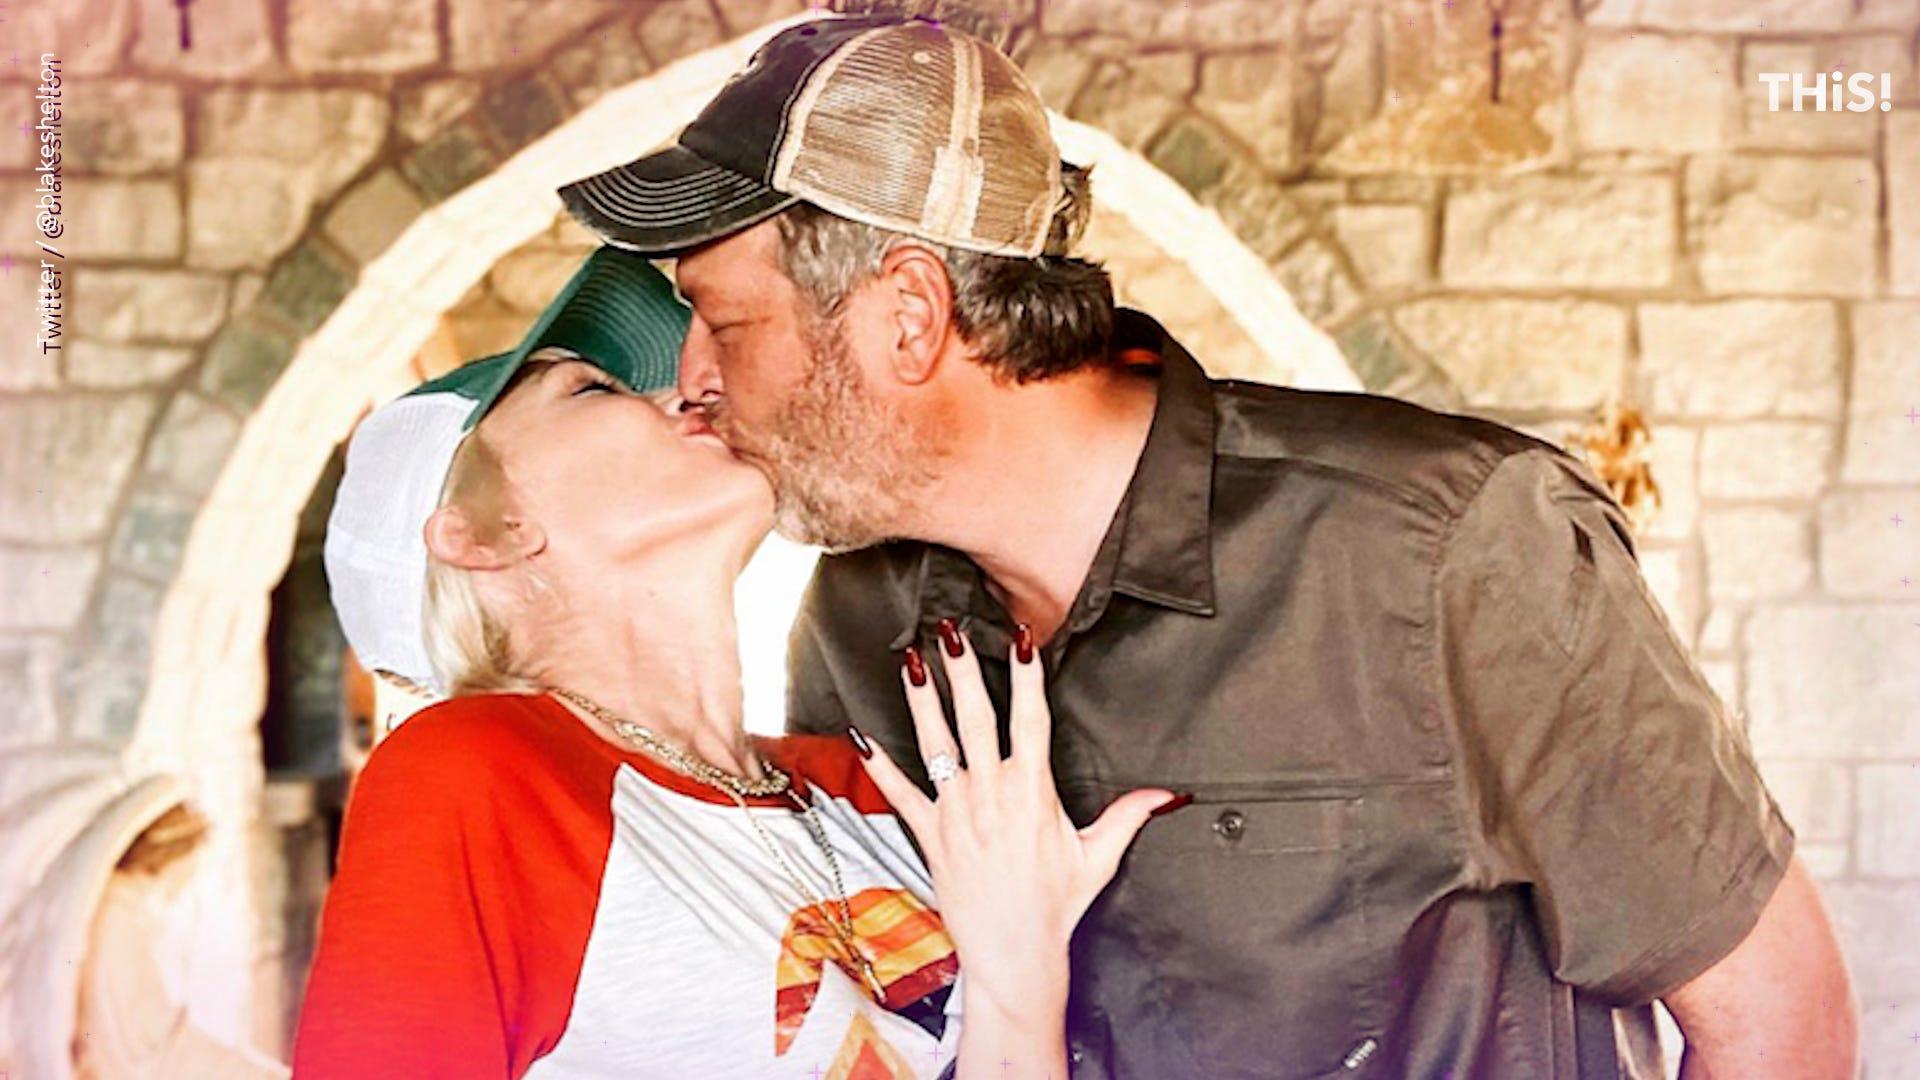 'Yes please!' Gwen Stefani and Blake Shelton announce engagement on social media